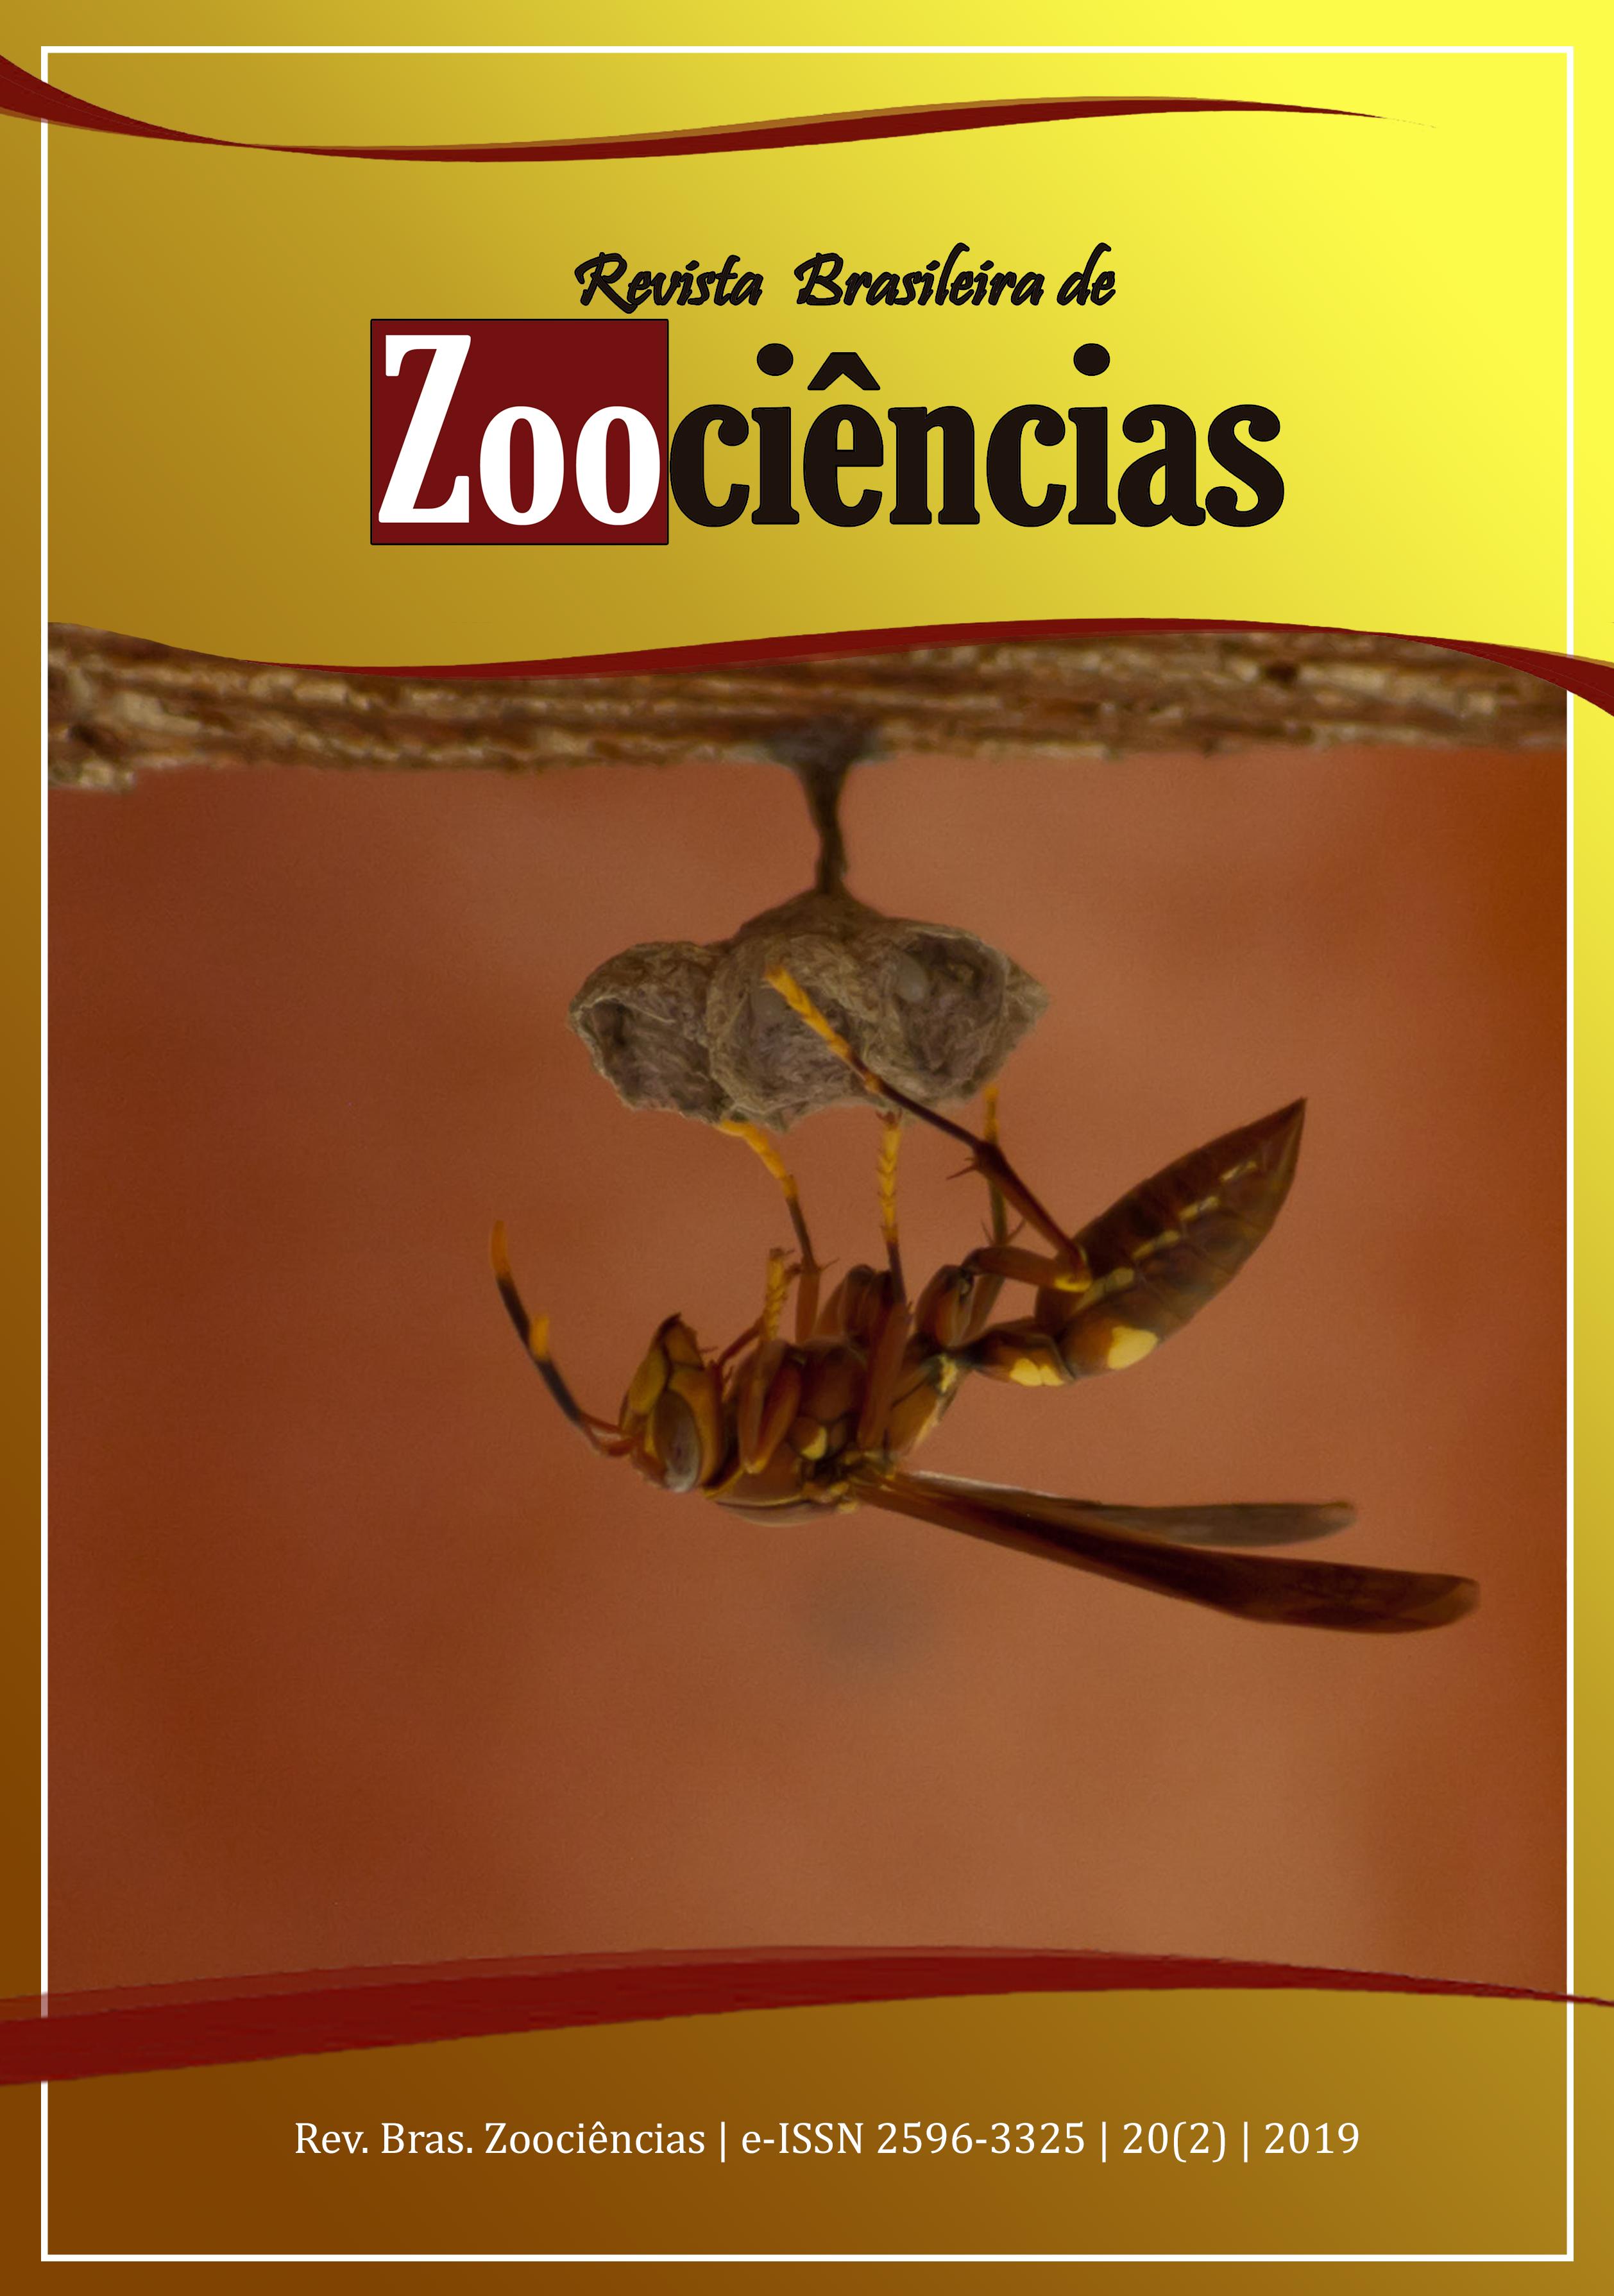 Espécime de Polistes simillimus, autoria de Bruno Corrêa Barbosa